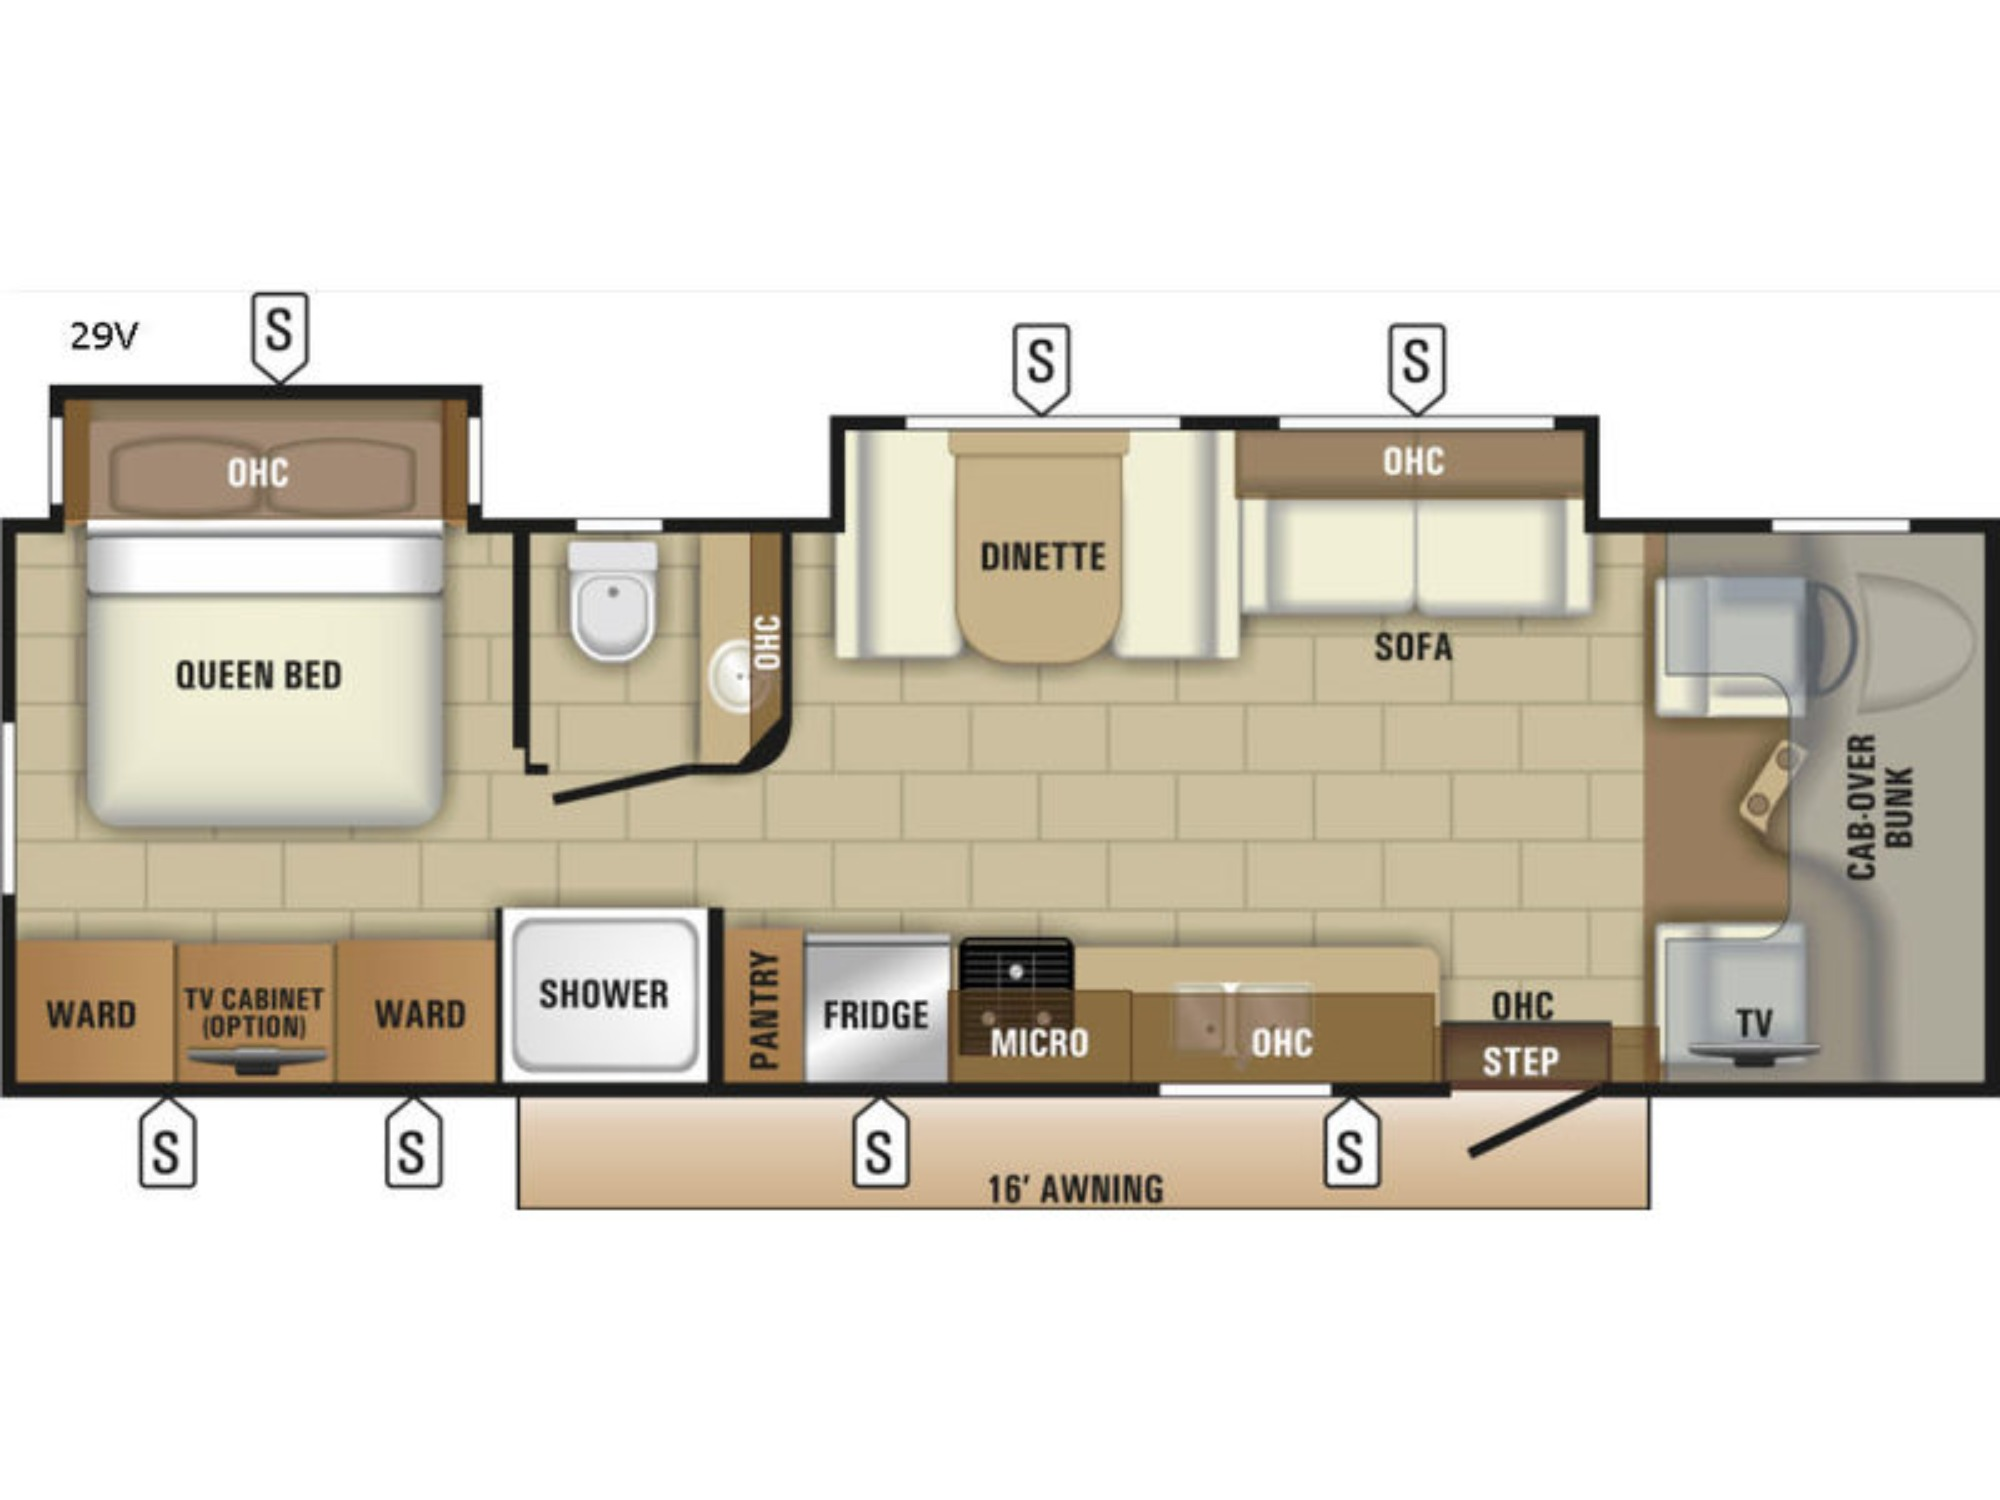 View Floor Plan for 2018 ENTEGRA COACH ODYSSEY 29V